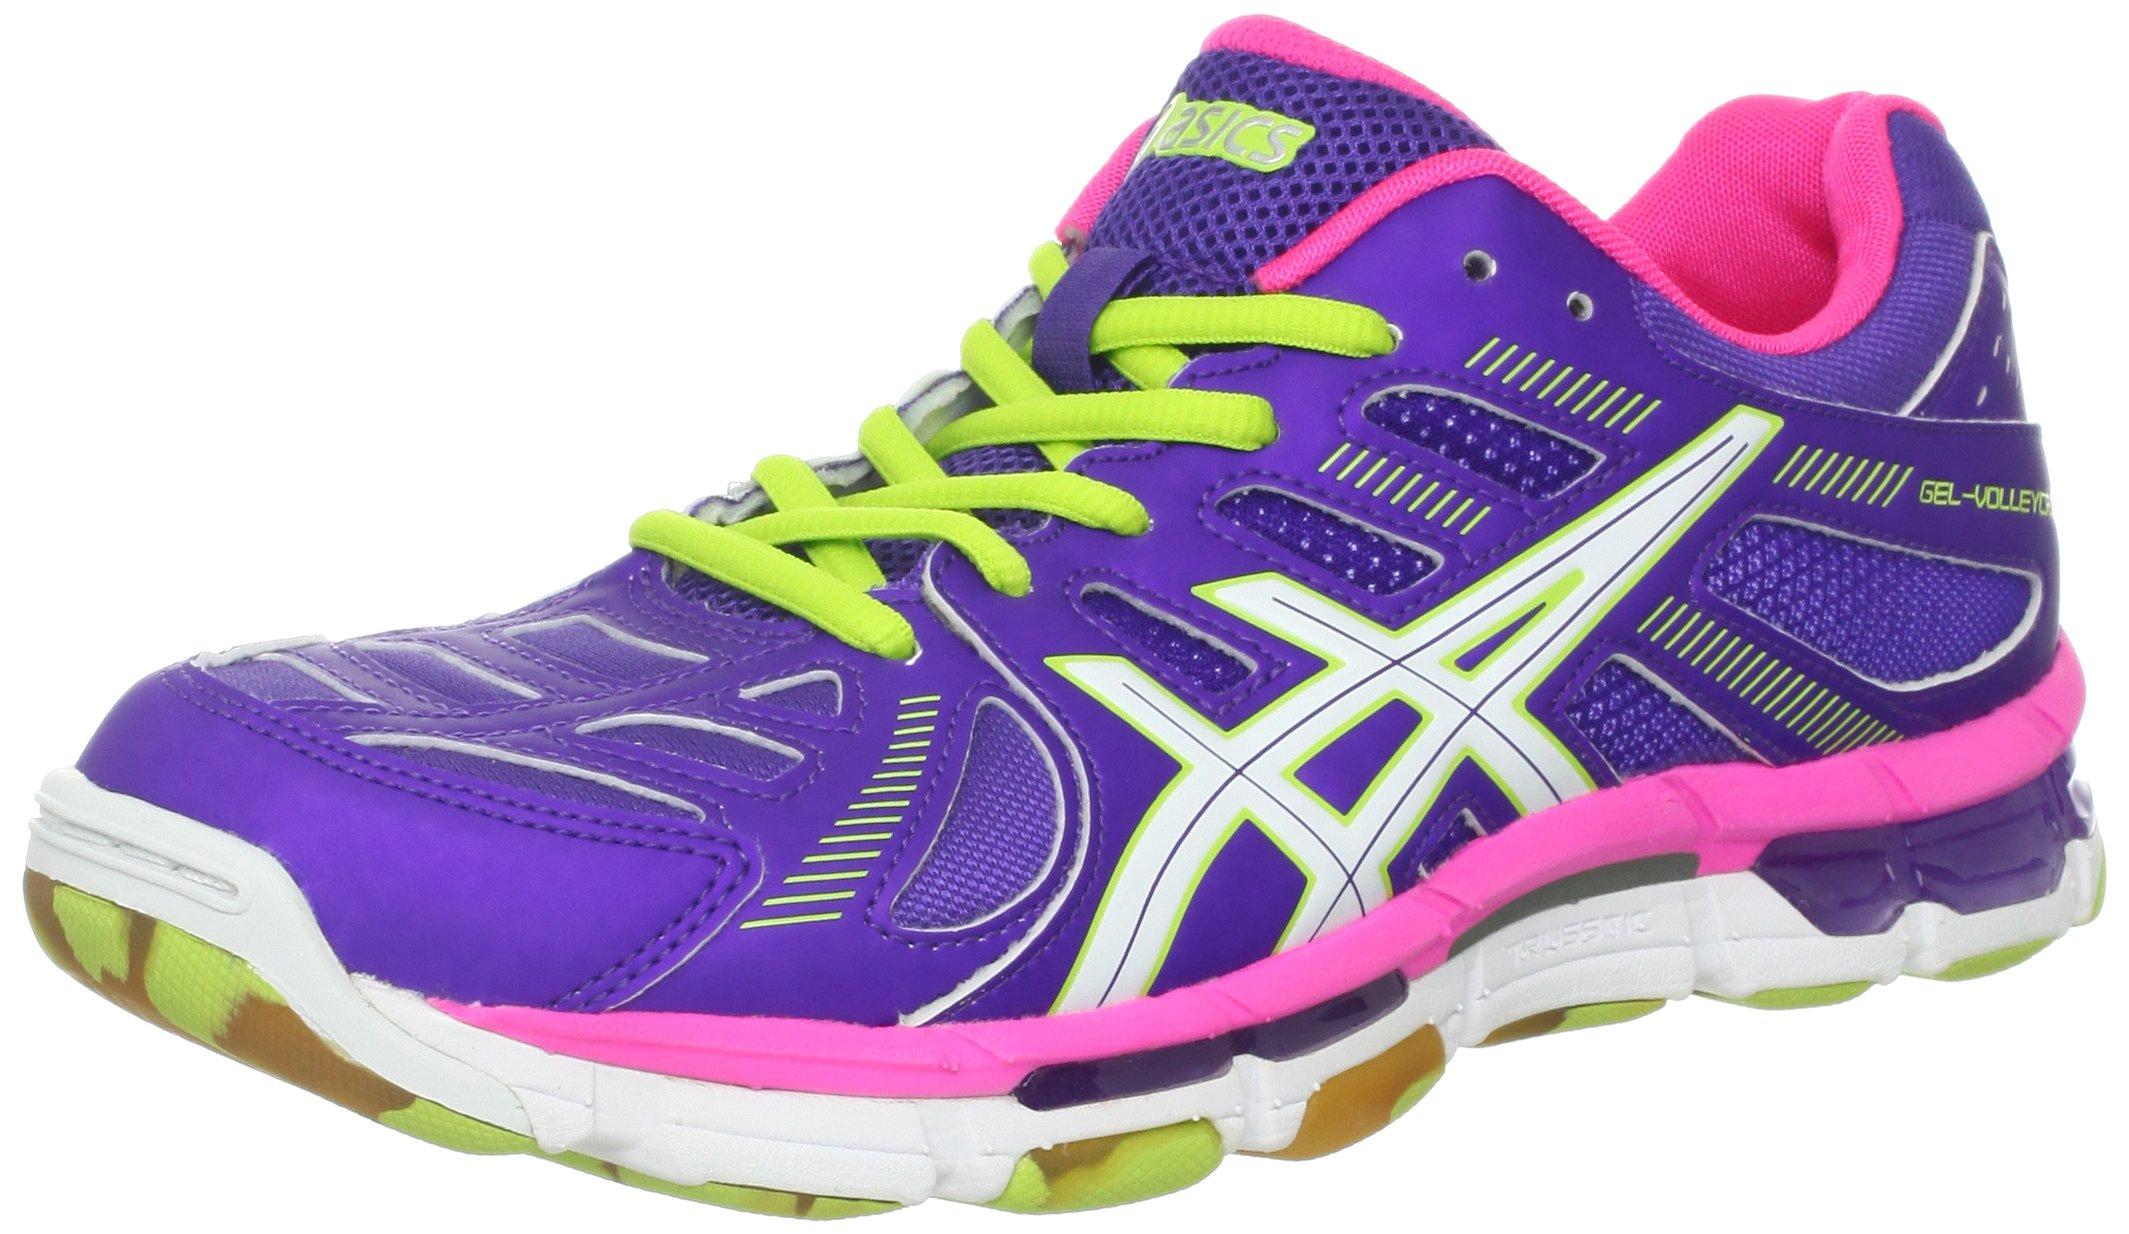 ASICS Women's GEL-Volleycross Revolution Volleyball Shoe